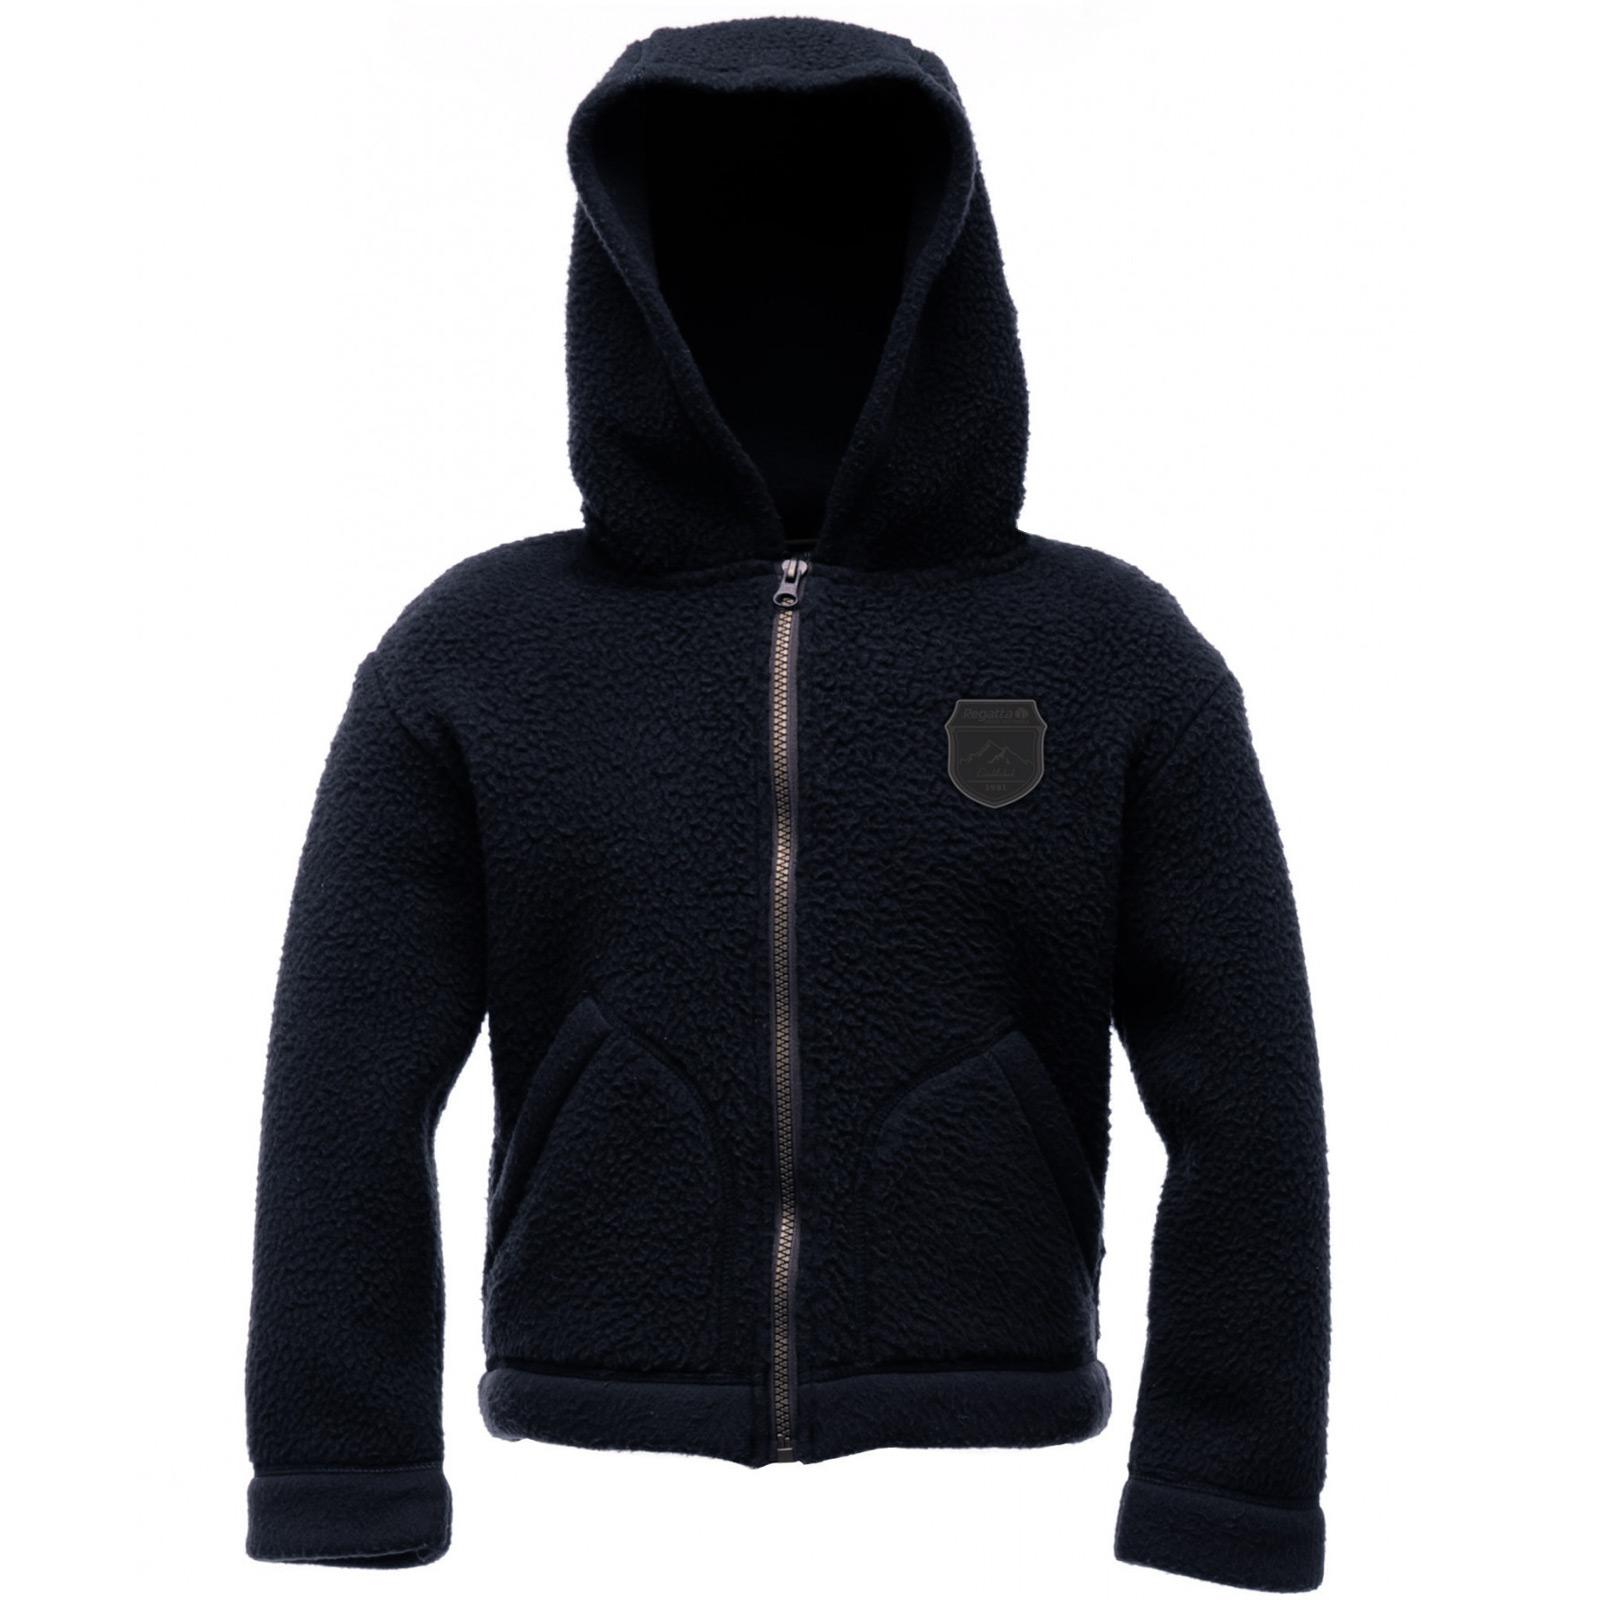 Regatta Childrens Roofus Black Hooded Chunky Fleece Jacket Zip Top